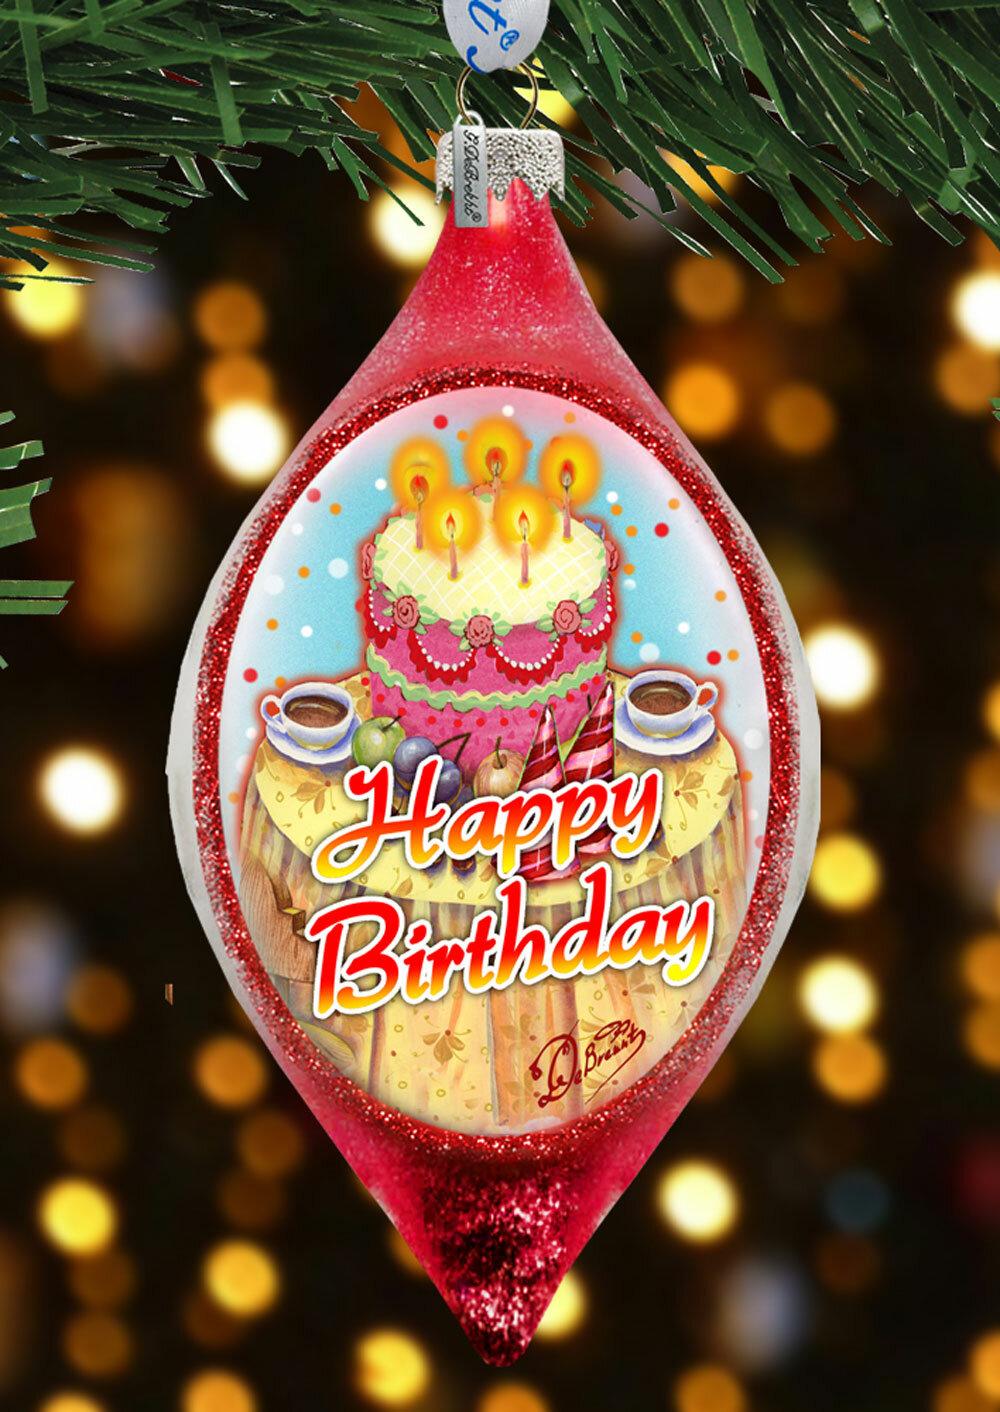 The Holiday Aisle Happy Birthday Glass Finial Ornament Holiday Splendor Collection Wayfair